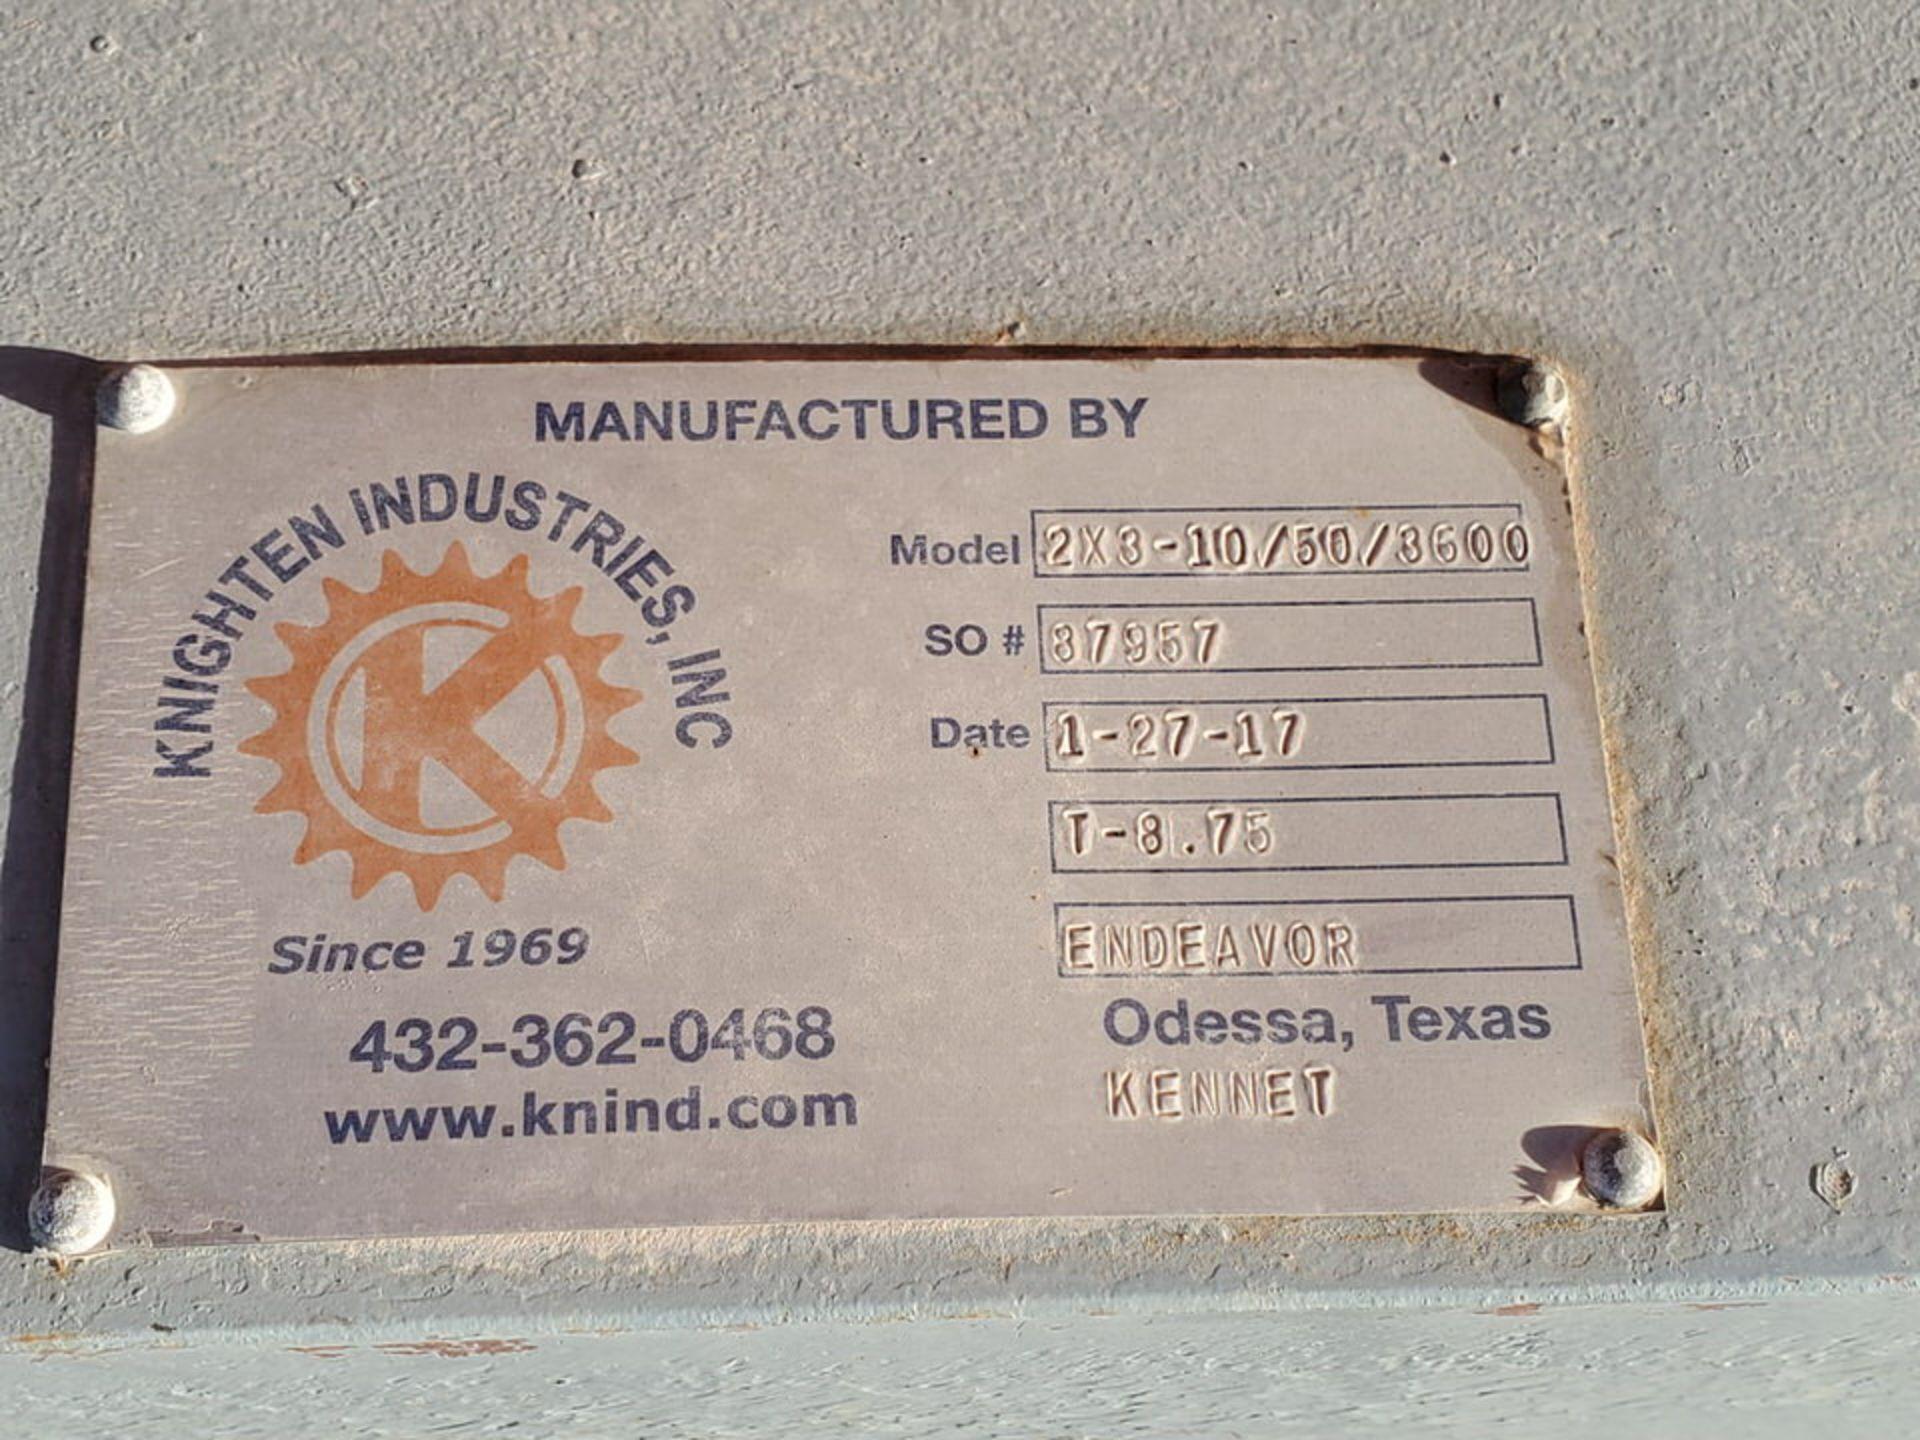 2017 Knighten Ind. 2x3-10/50/3600 2x3-10 Centrifugal Pump - Image 7 of 7